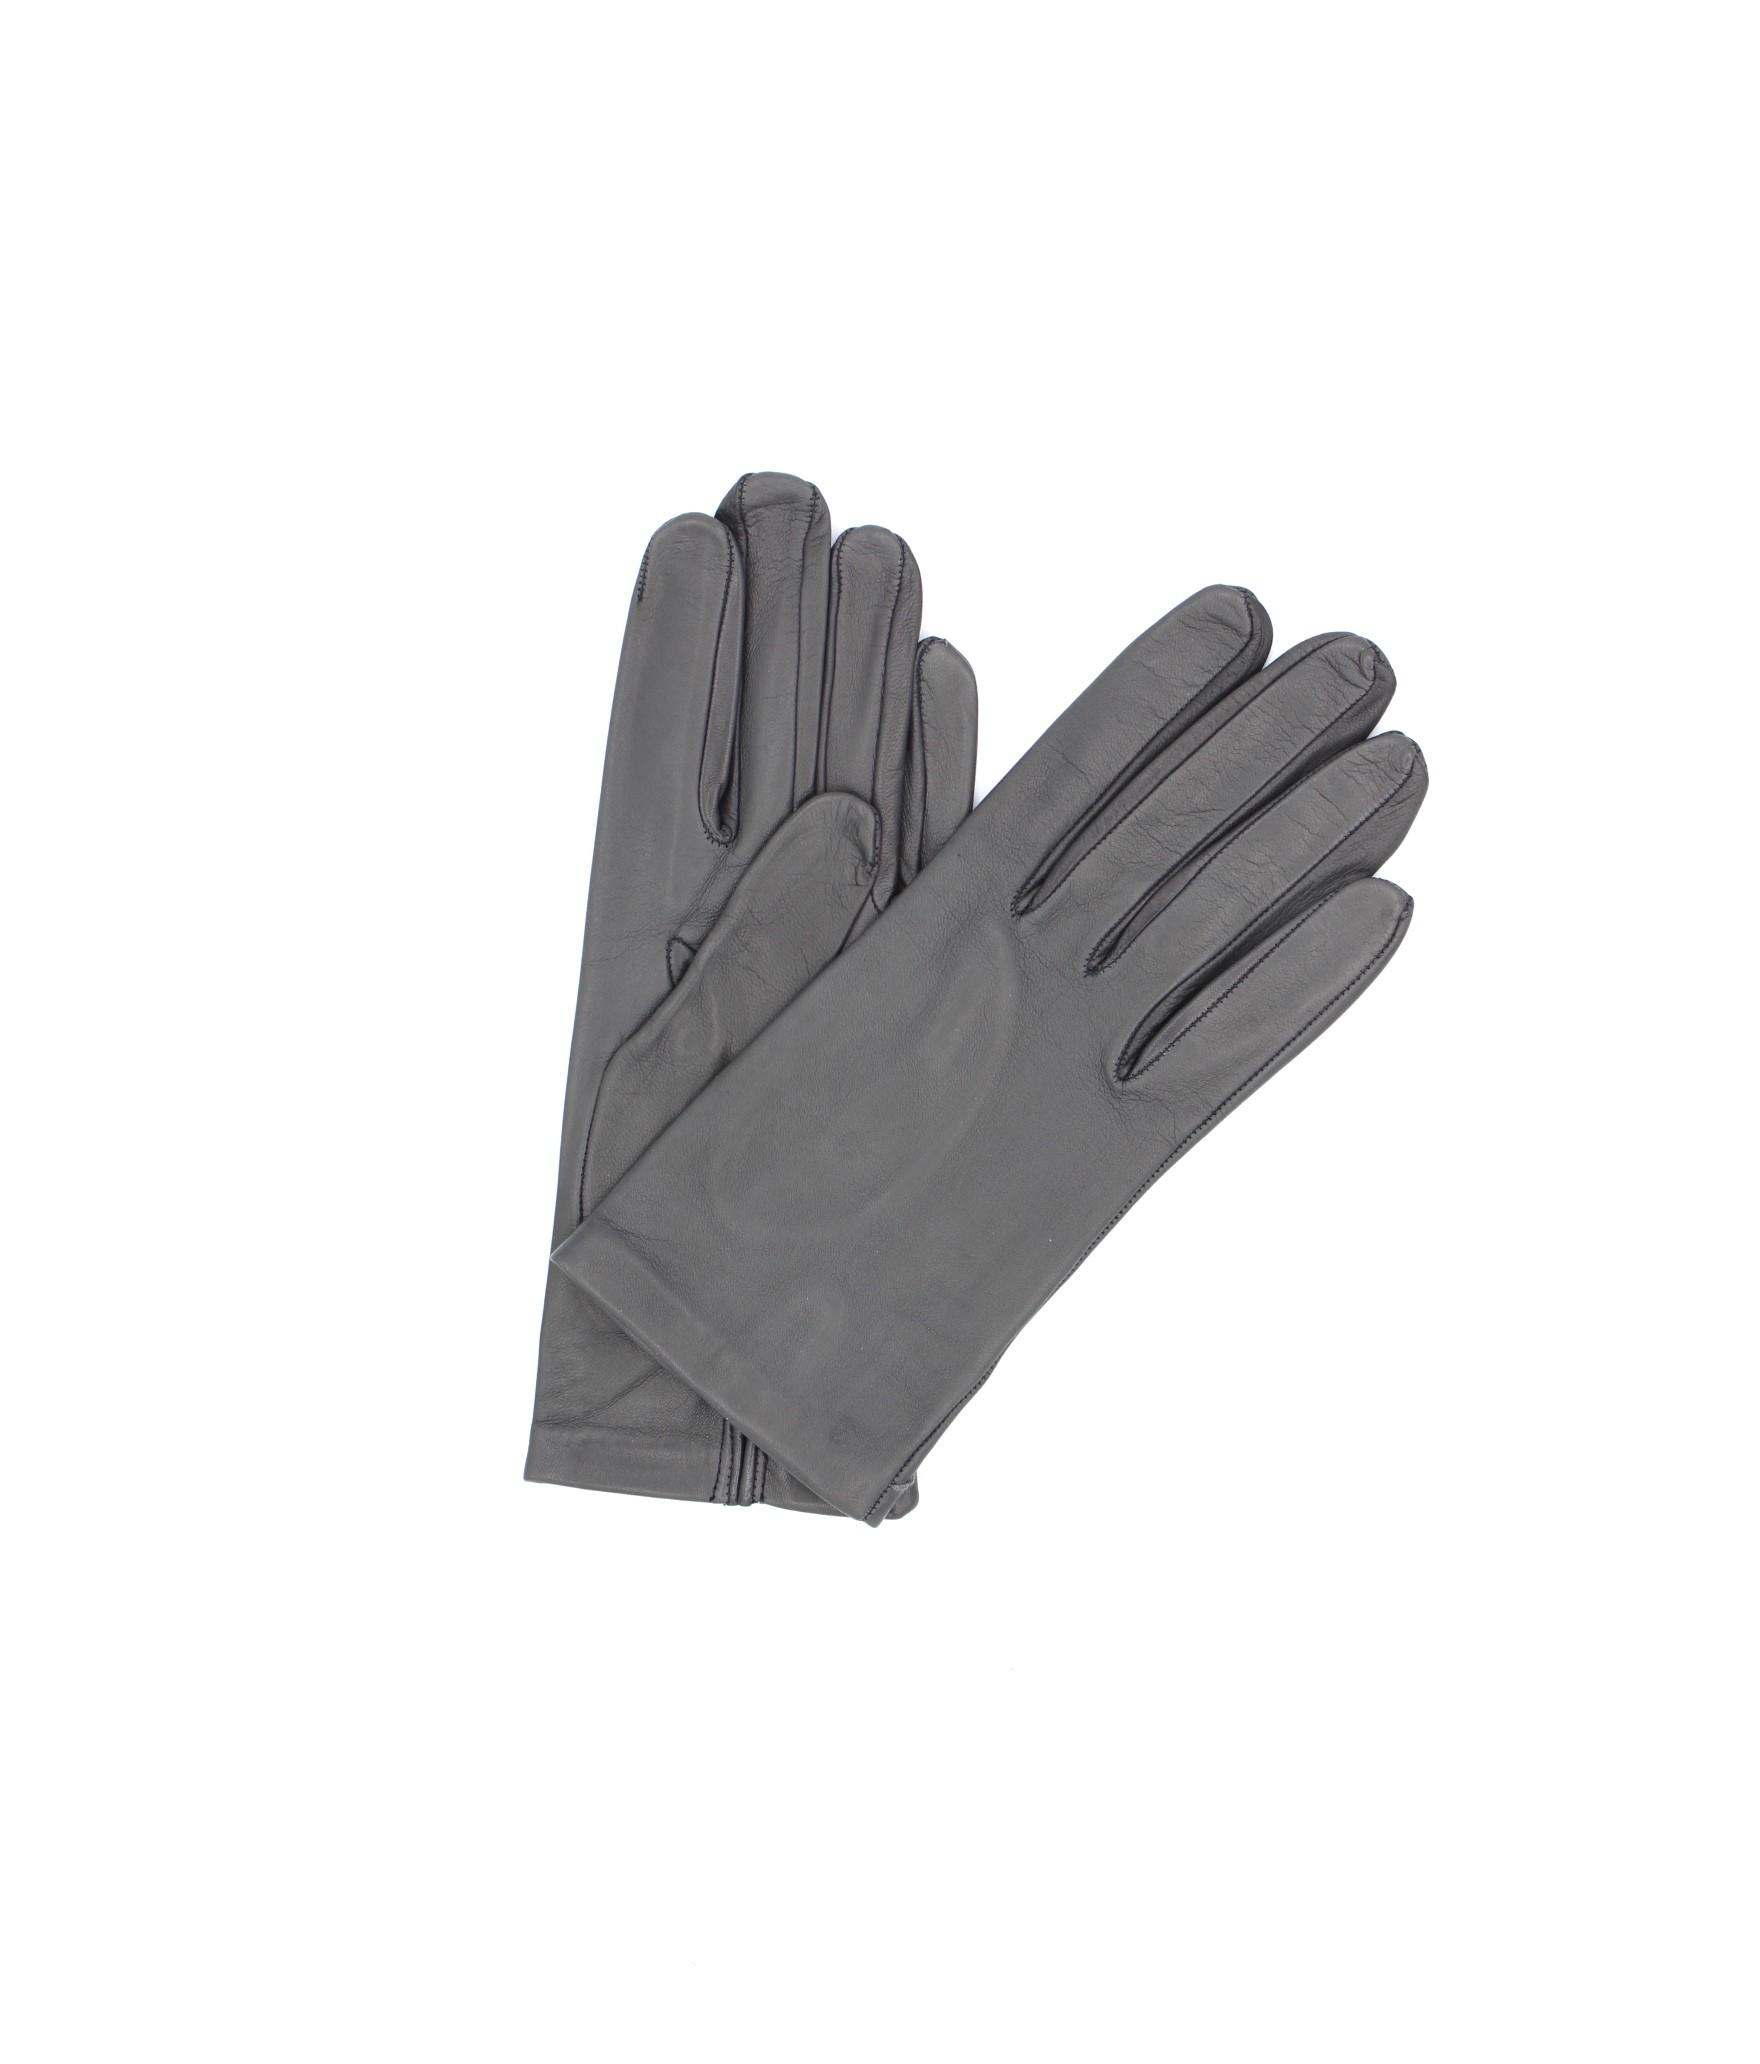 Nappa leather gloves Silk lined Dark Grey Sermoneta Gloves